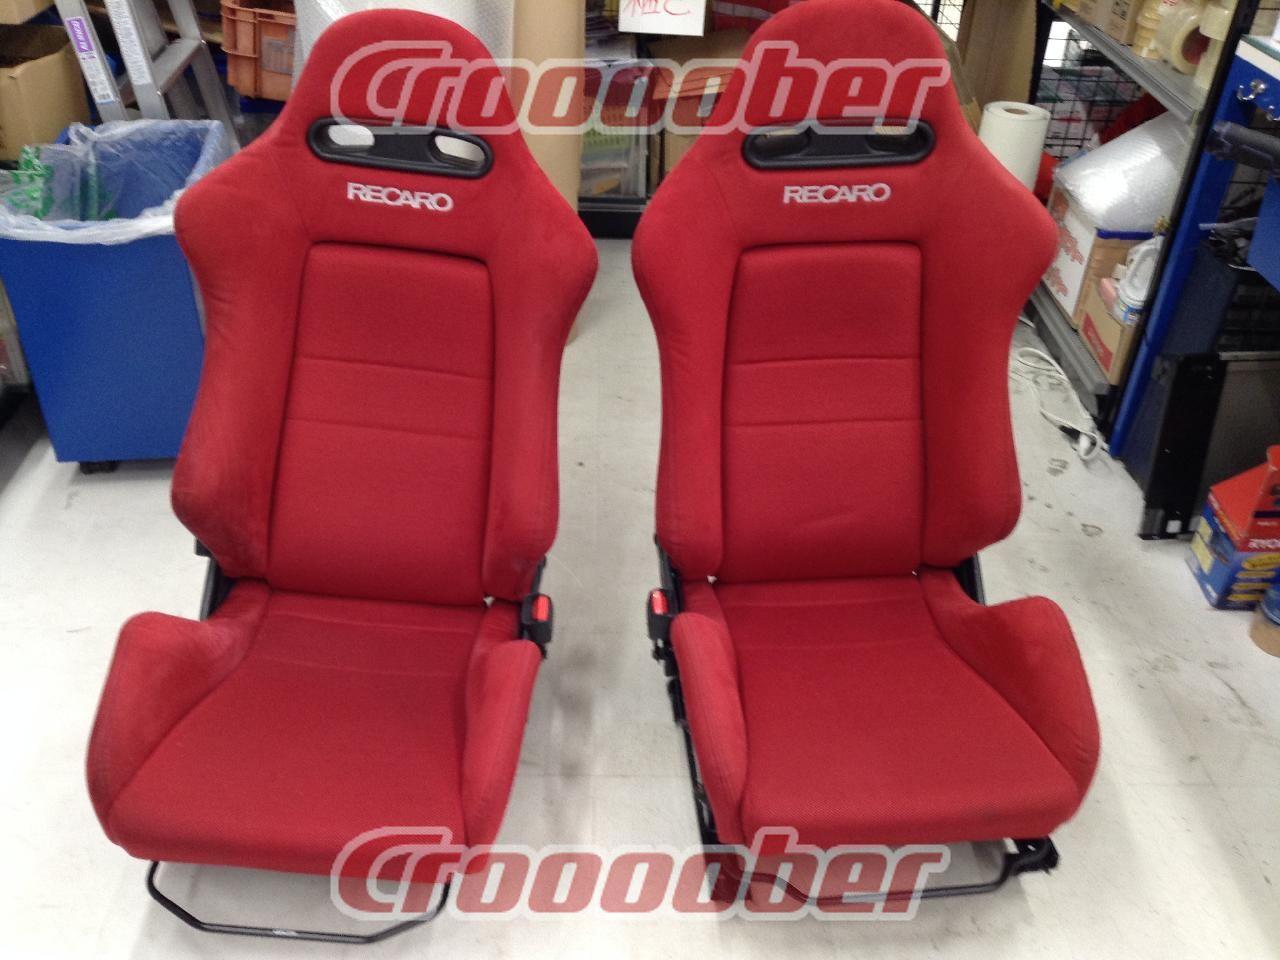 Honda Genuine Recaro Semi Bucket Seat Reclining Seats Recaro Croooober